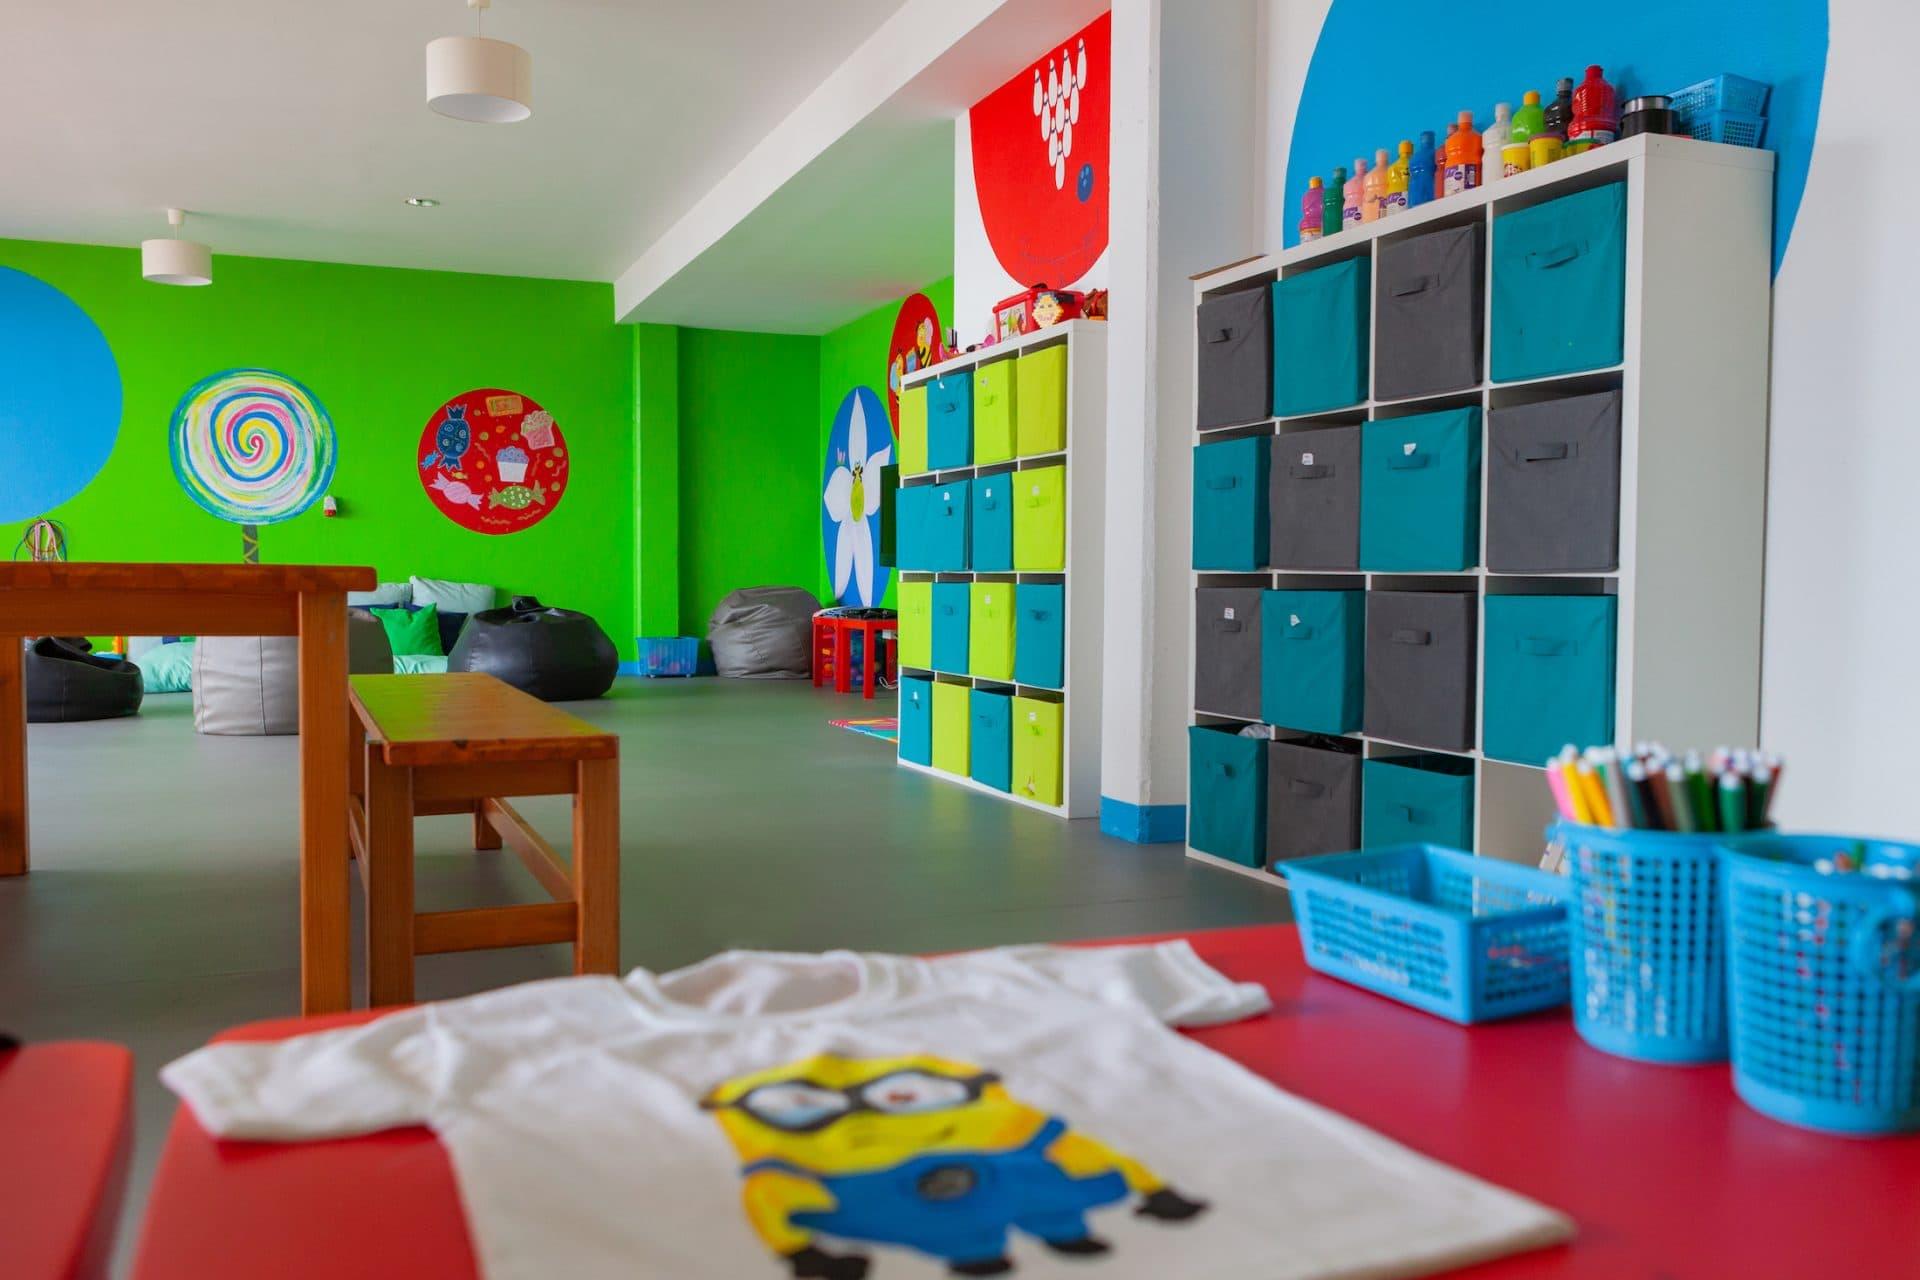 aquatica-kids-club-overview-VidaMar-hotels-resorts-madeira